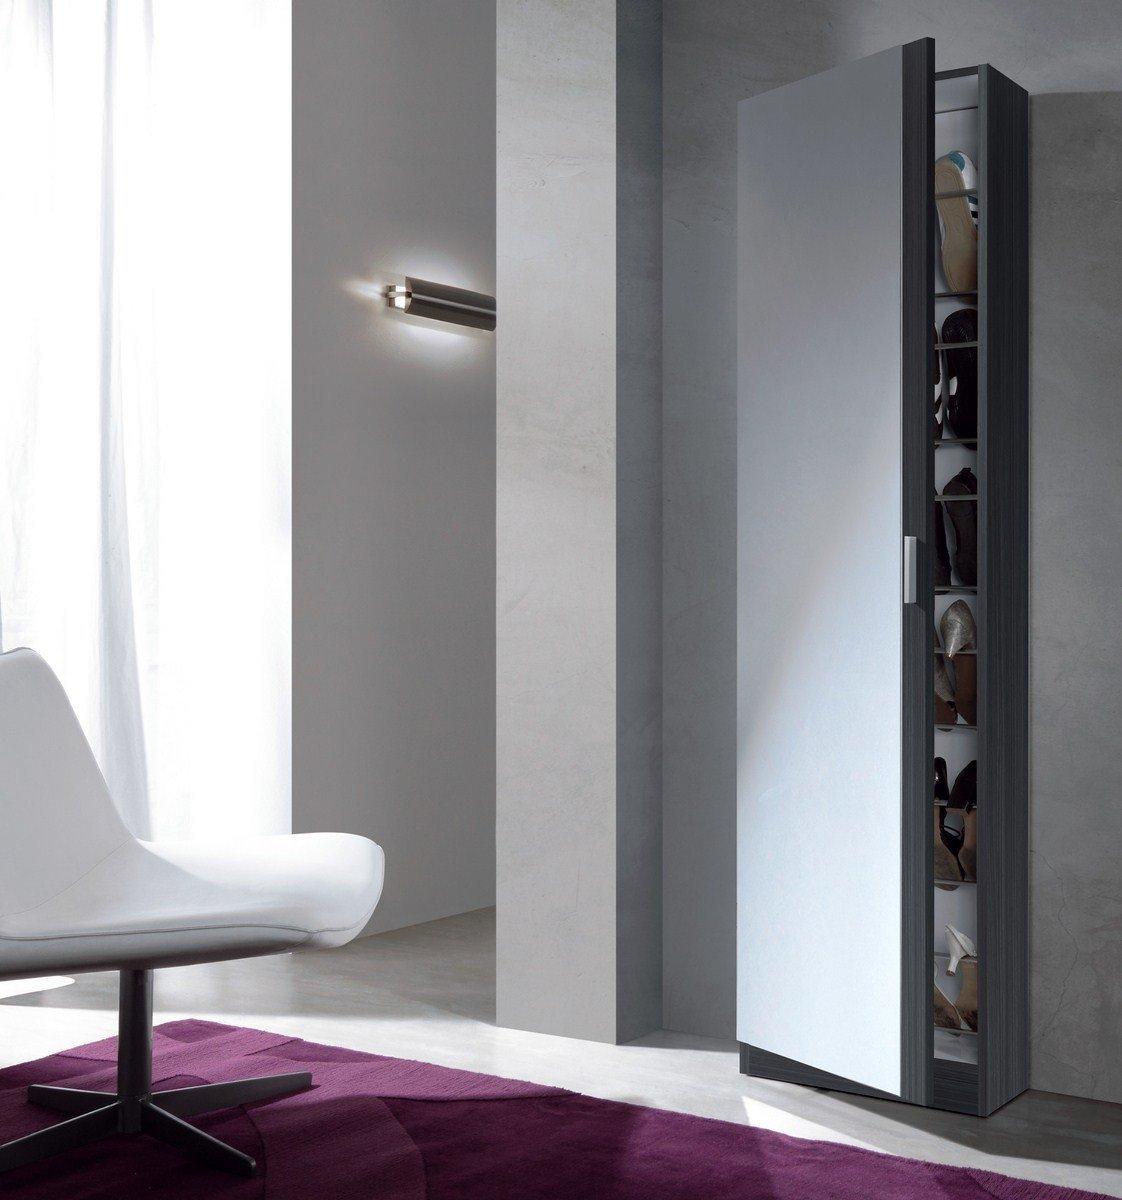 Mueble zapatero con puerta cristal espejo armario for Mueble zapatero con espejo